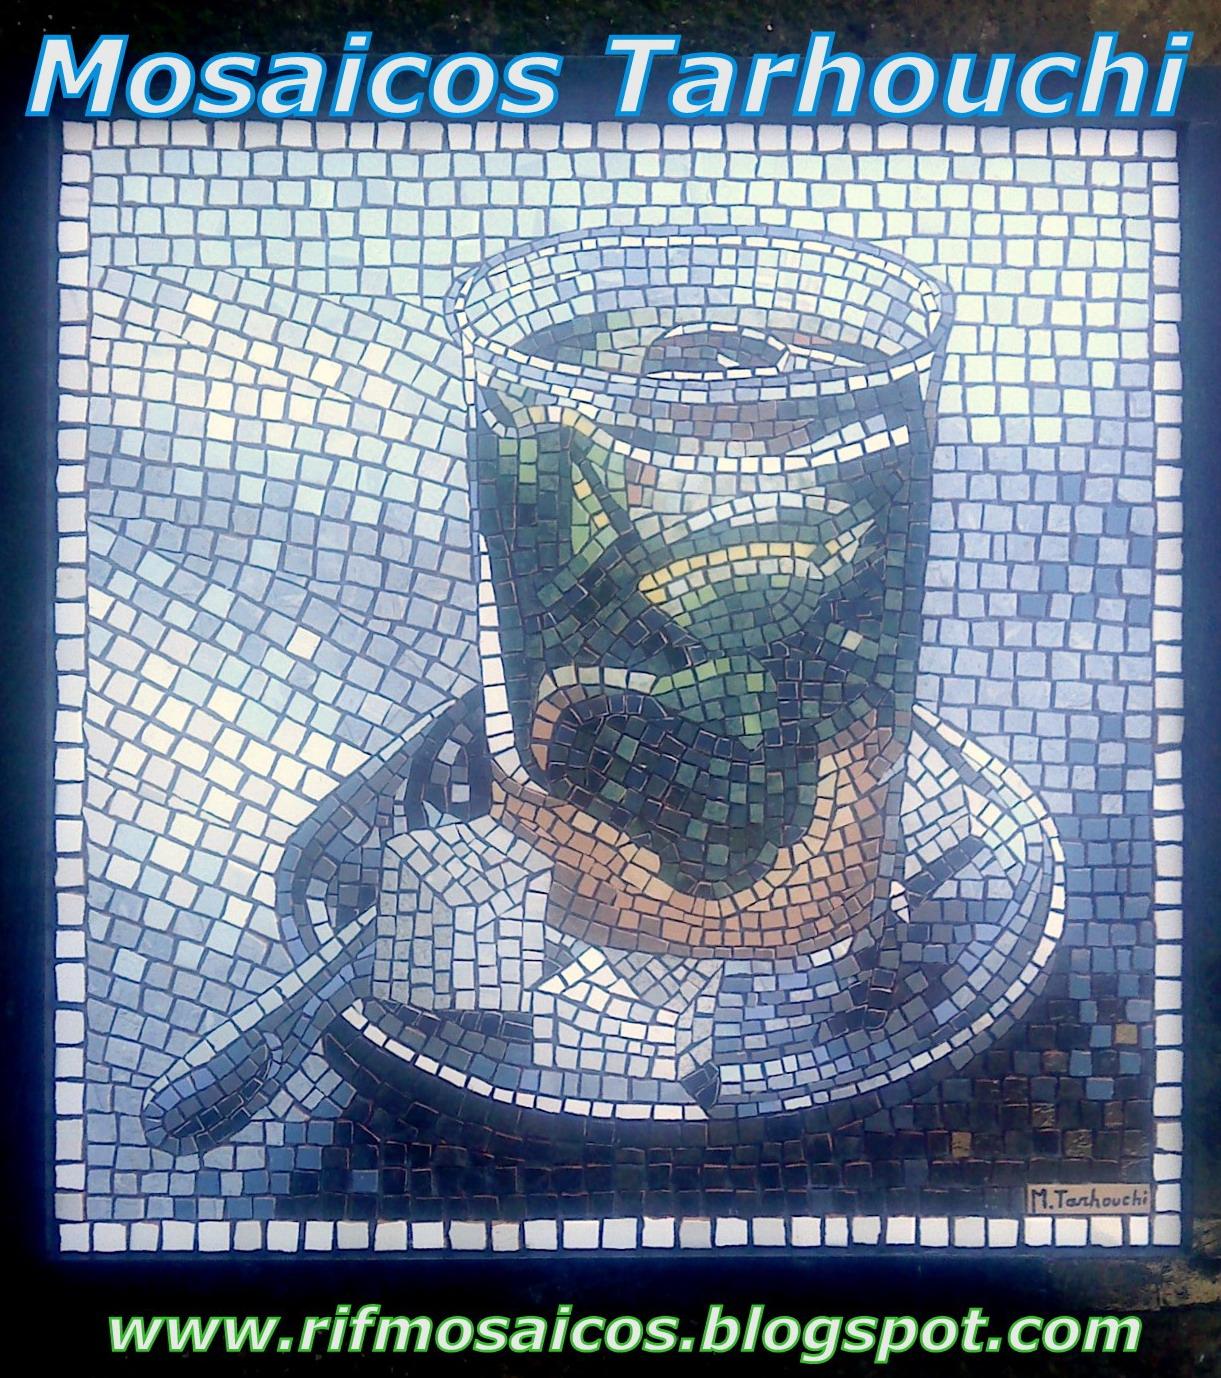 T marroqui mosaicos artist m tarhouchi art mosaic for Mosaico marroqui